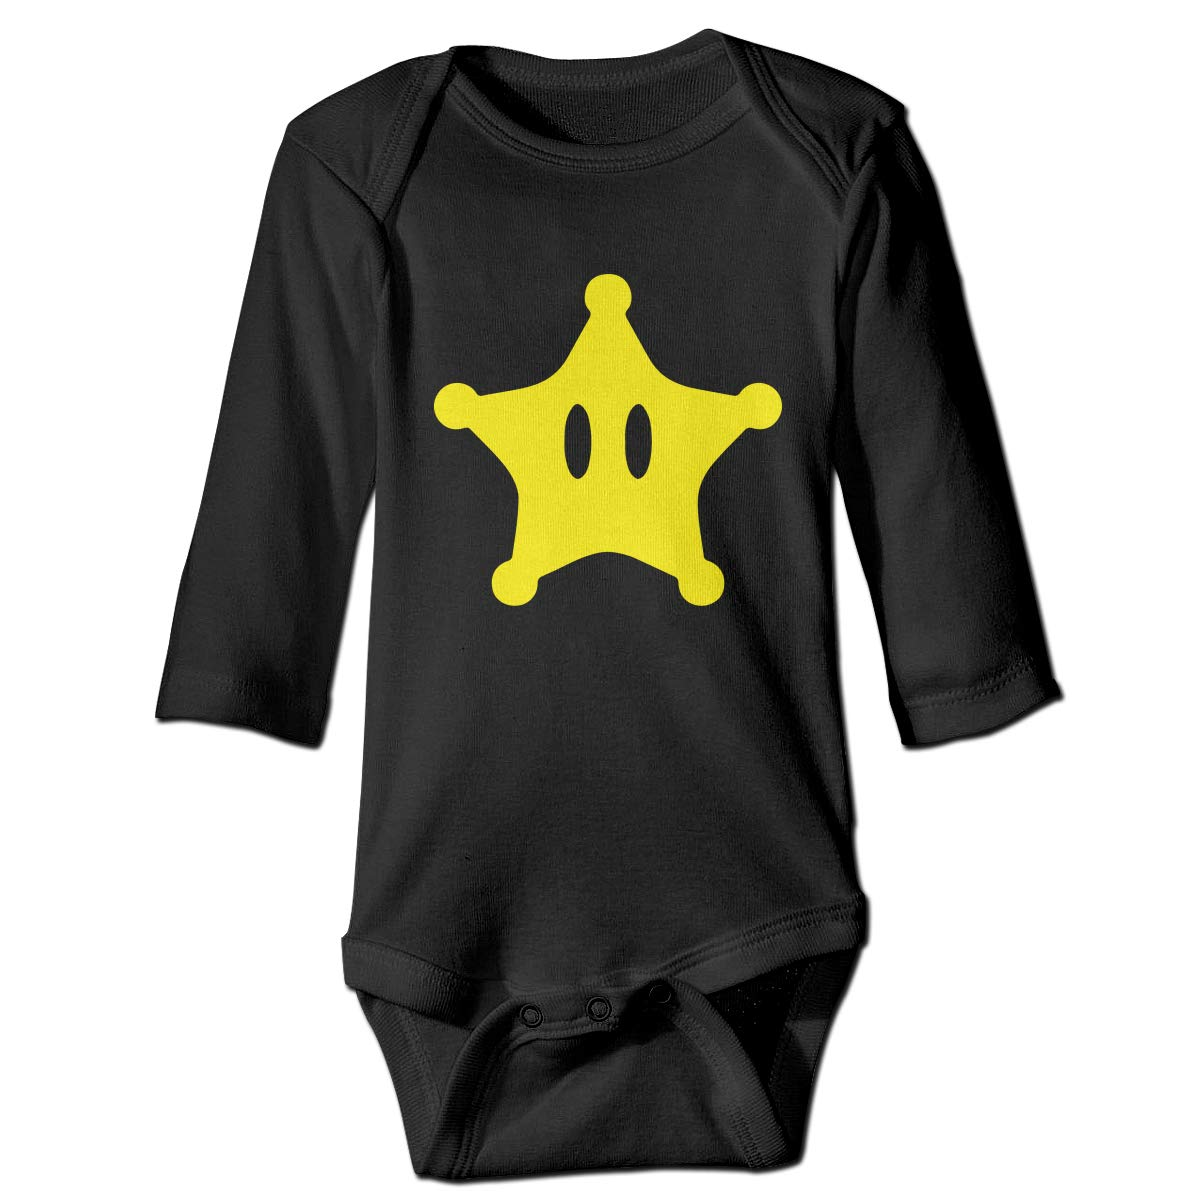 Suit 6-24 Months CZDedgQ99 Newborn Star Long Sleeve Climbing Clothes Pajamas Sleepwear